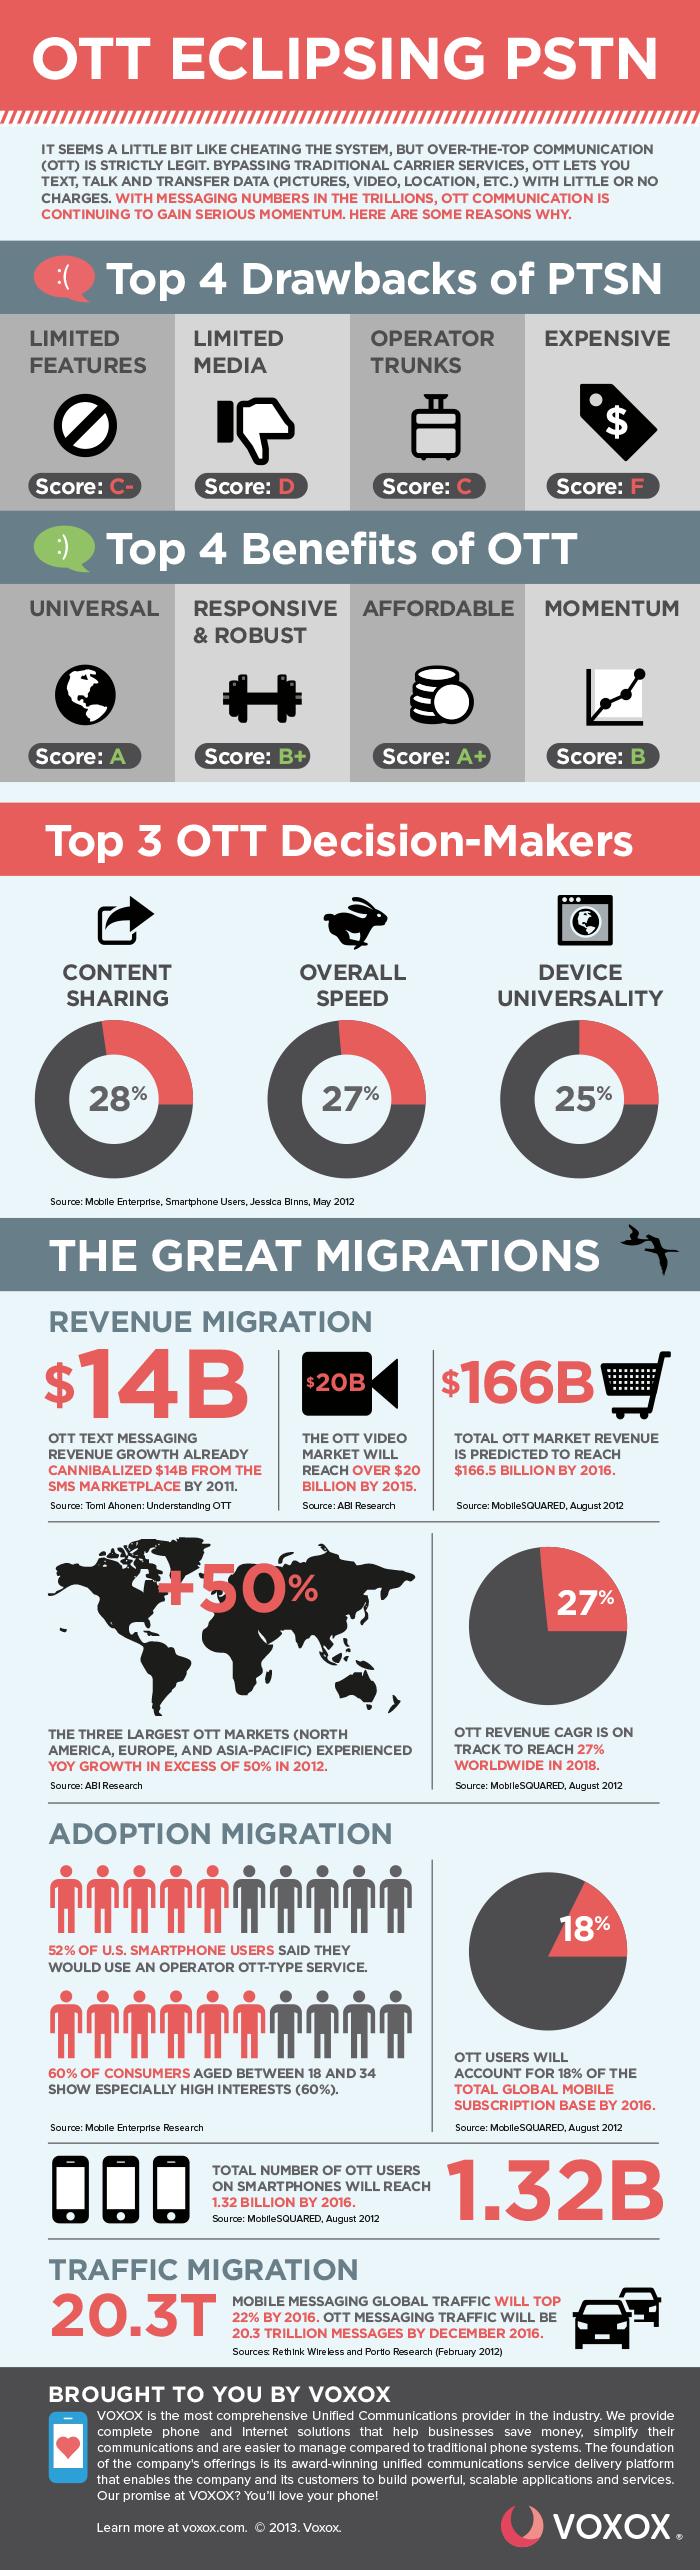 OTT Apps Voxox Infographic